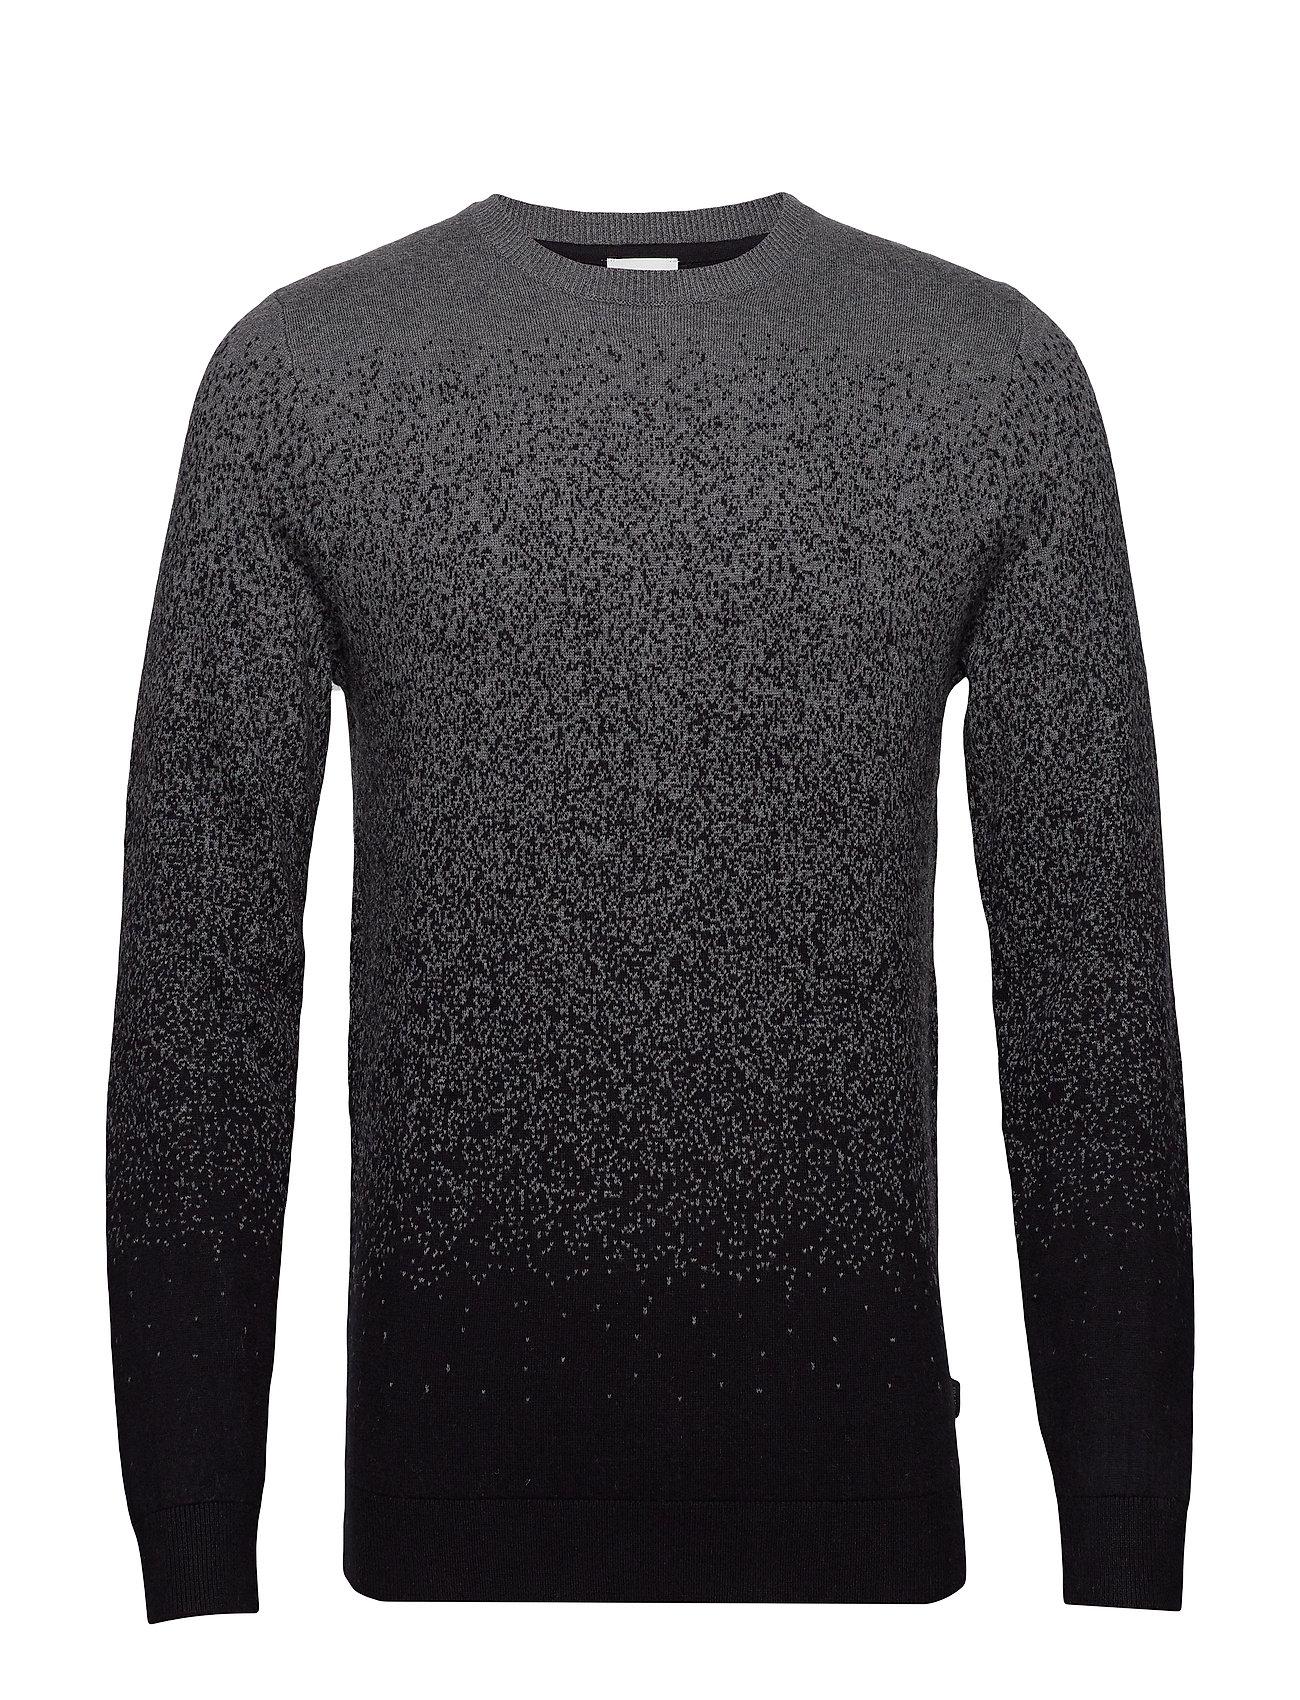 Esprit Casual Sweaters - GREY